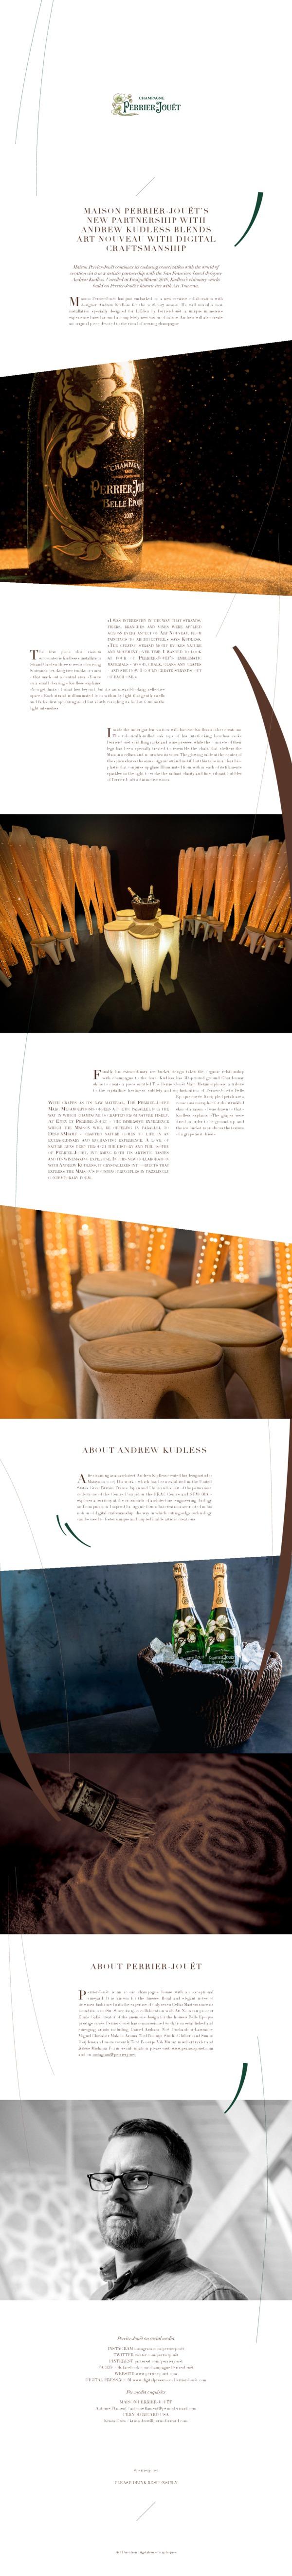 Perrier-Jouët press pack- Design Miami 2016.pdf